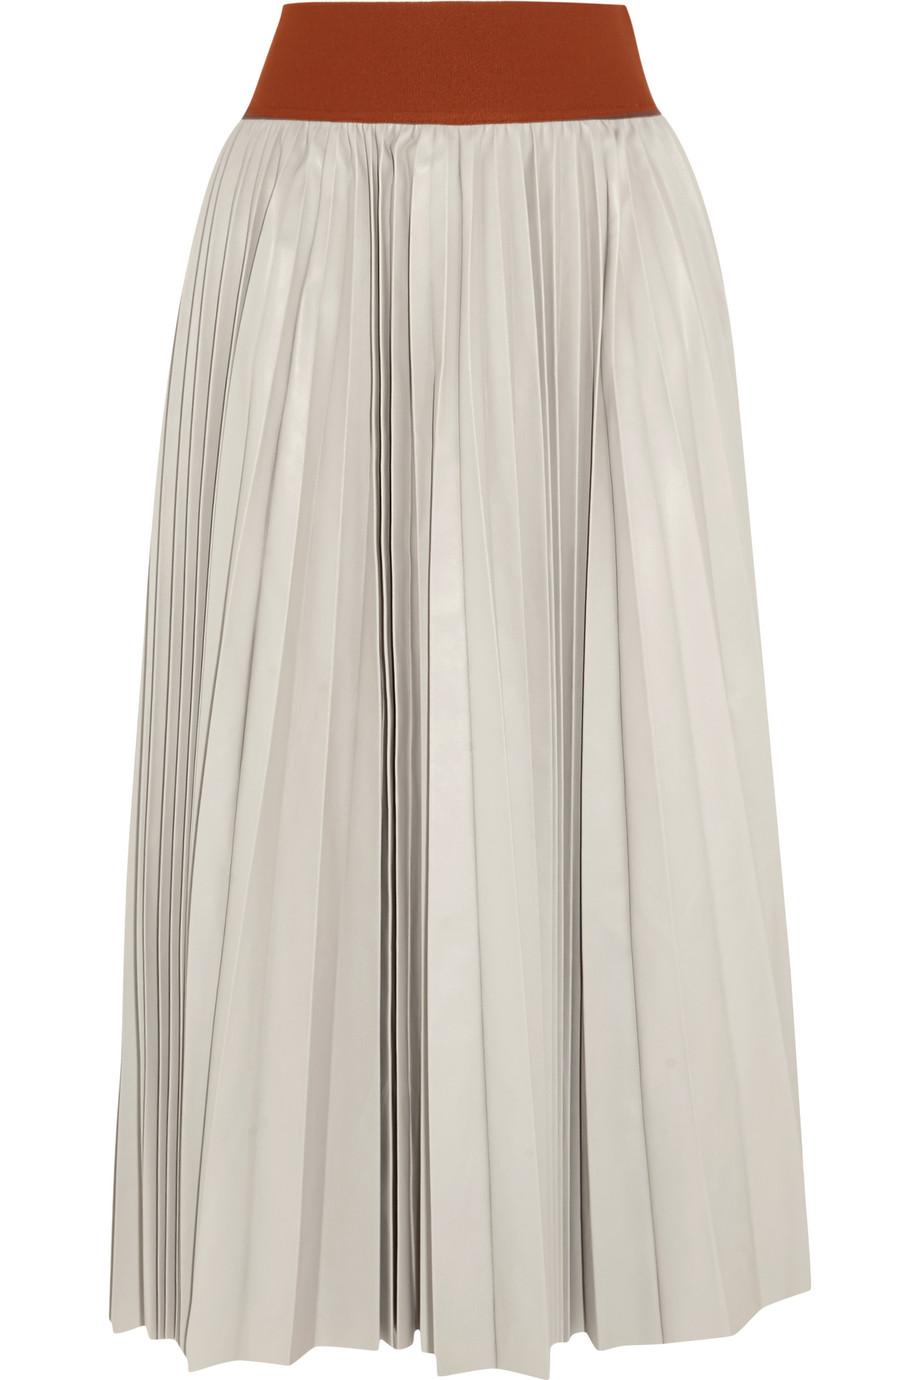 Marni Plissé-Leather Skirt, Stone, Women's, Size: 38